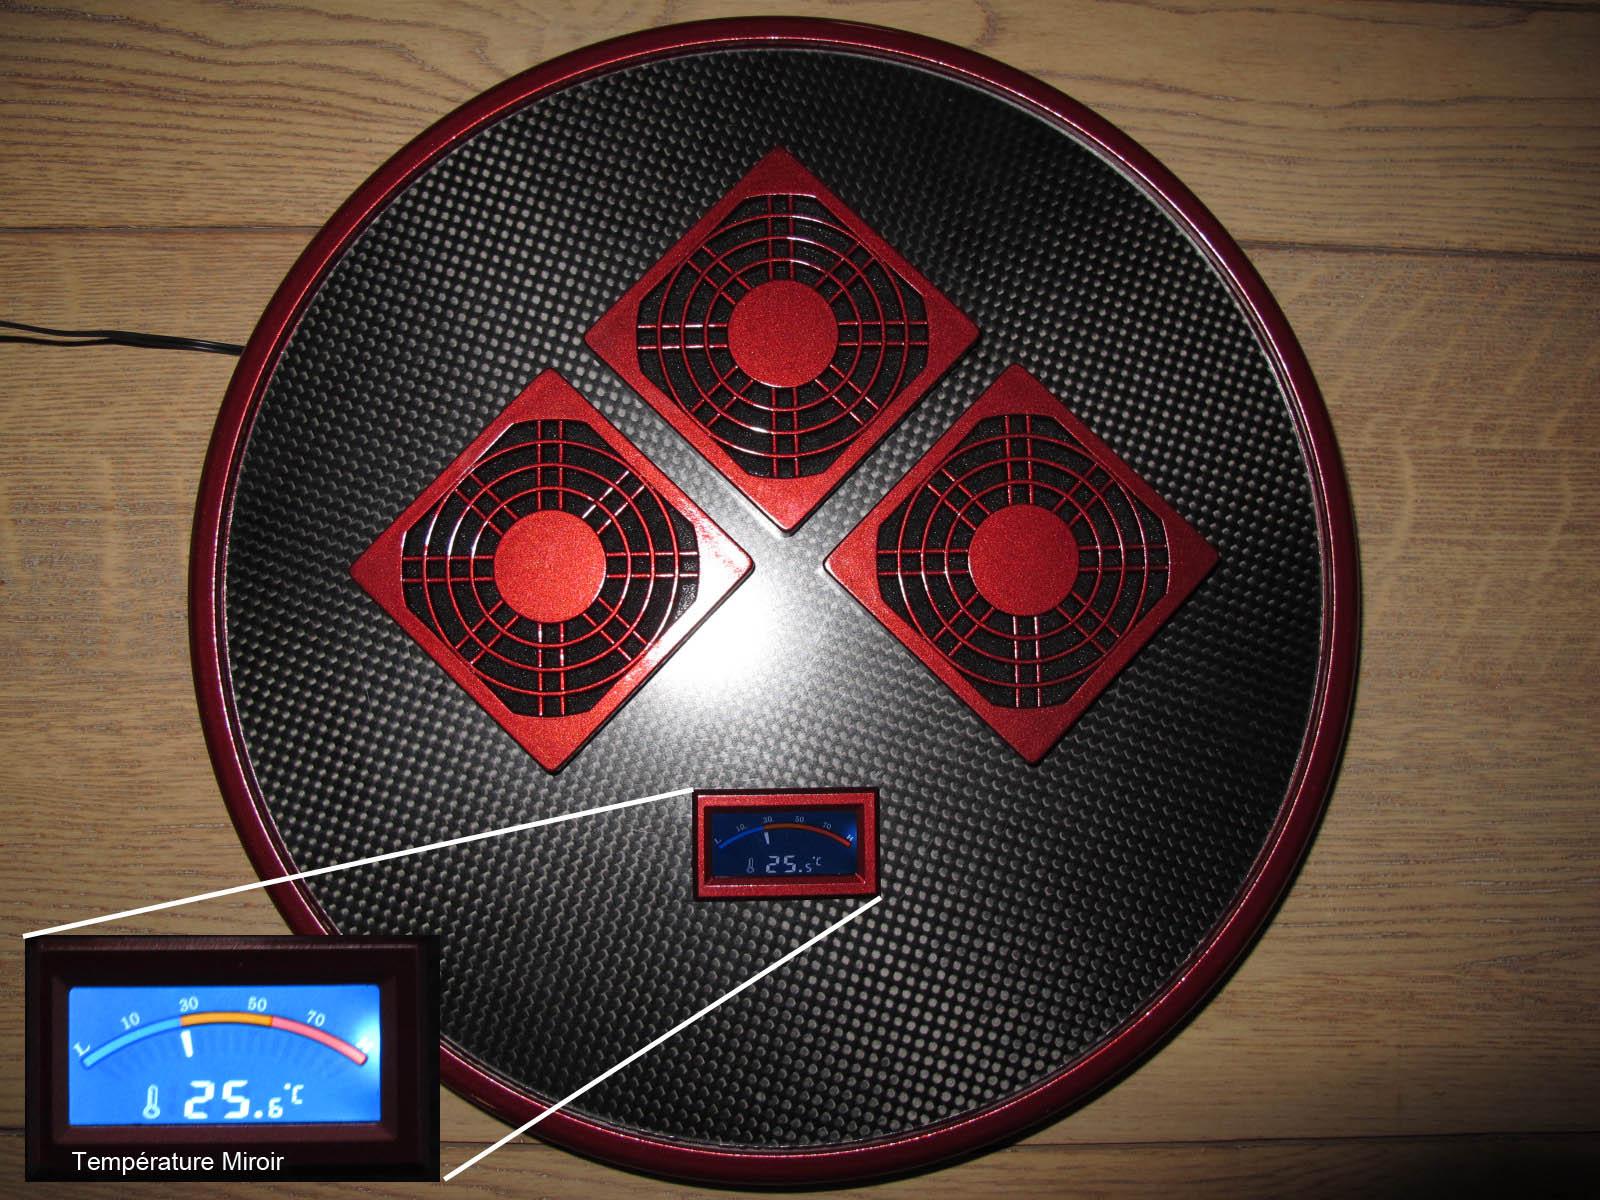 refroidissement 700D Fermeture-tube-ventilation-miroir-newton-bernier-francois-astrographe